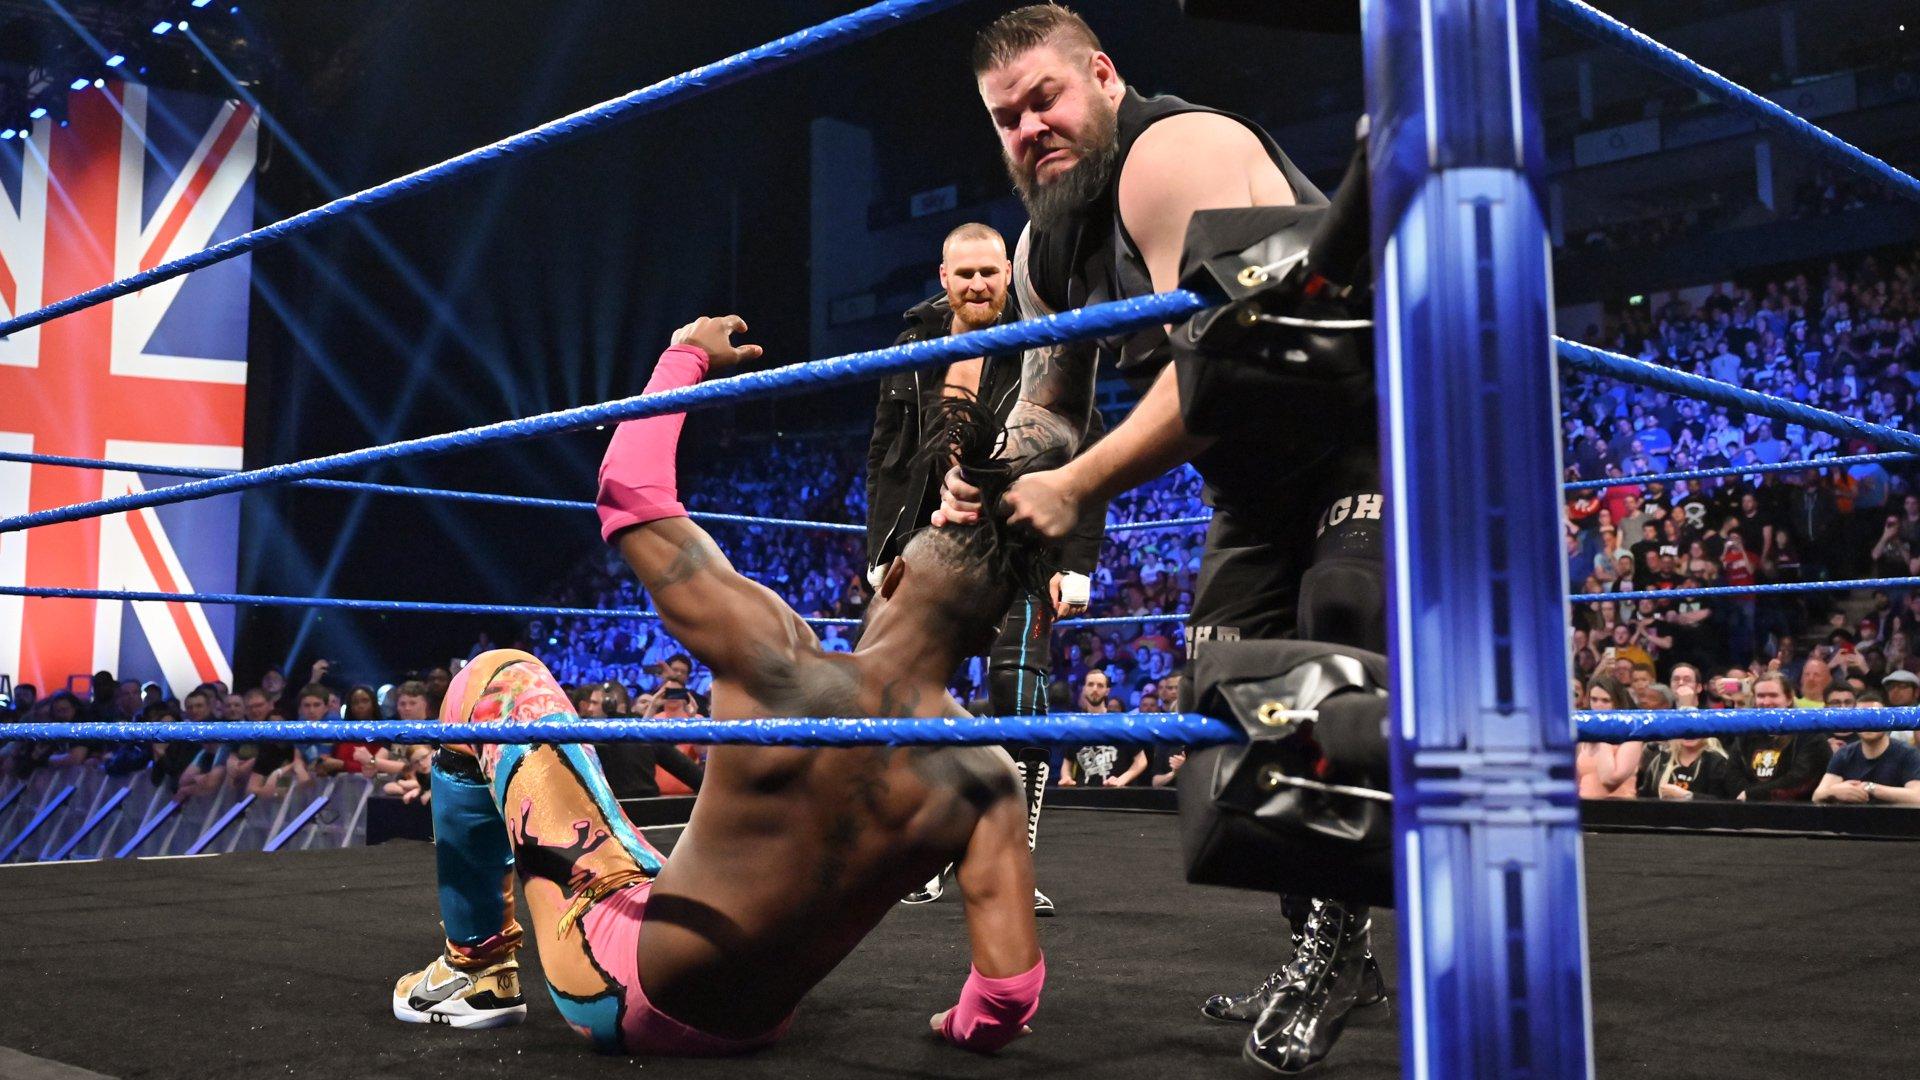 Kevin Owens & Sami Zayn piègent Kofi Kingston: SmackDown LIVE, 14 Mai 2019